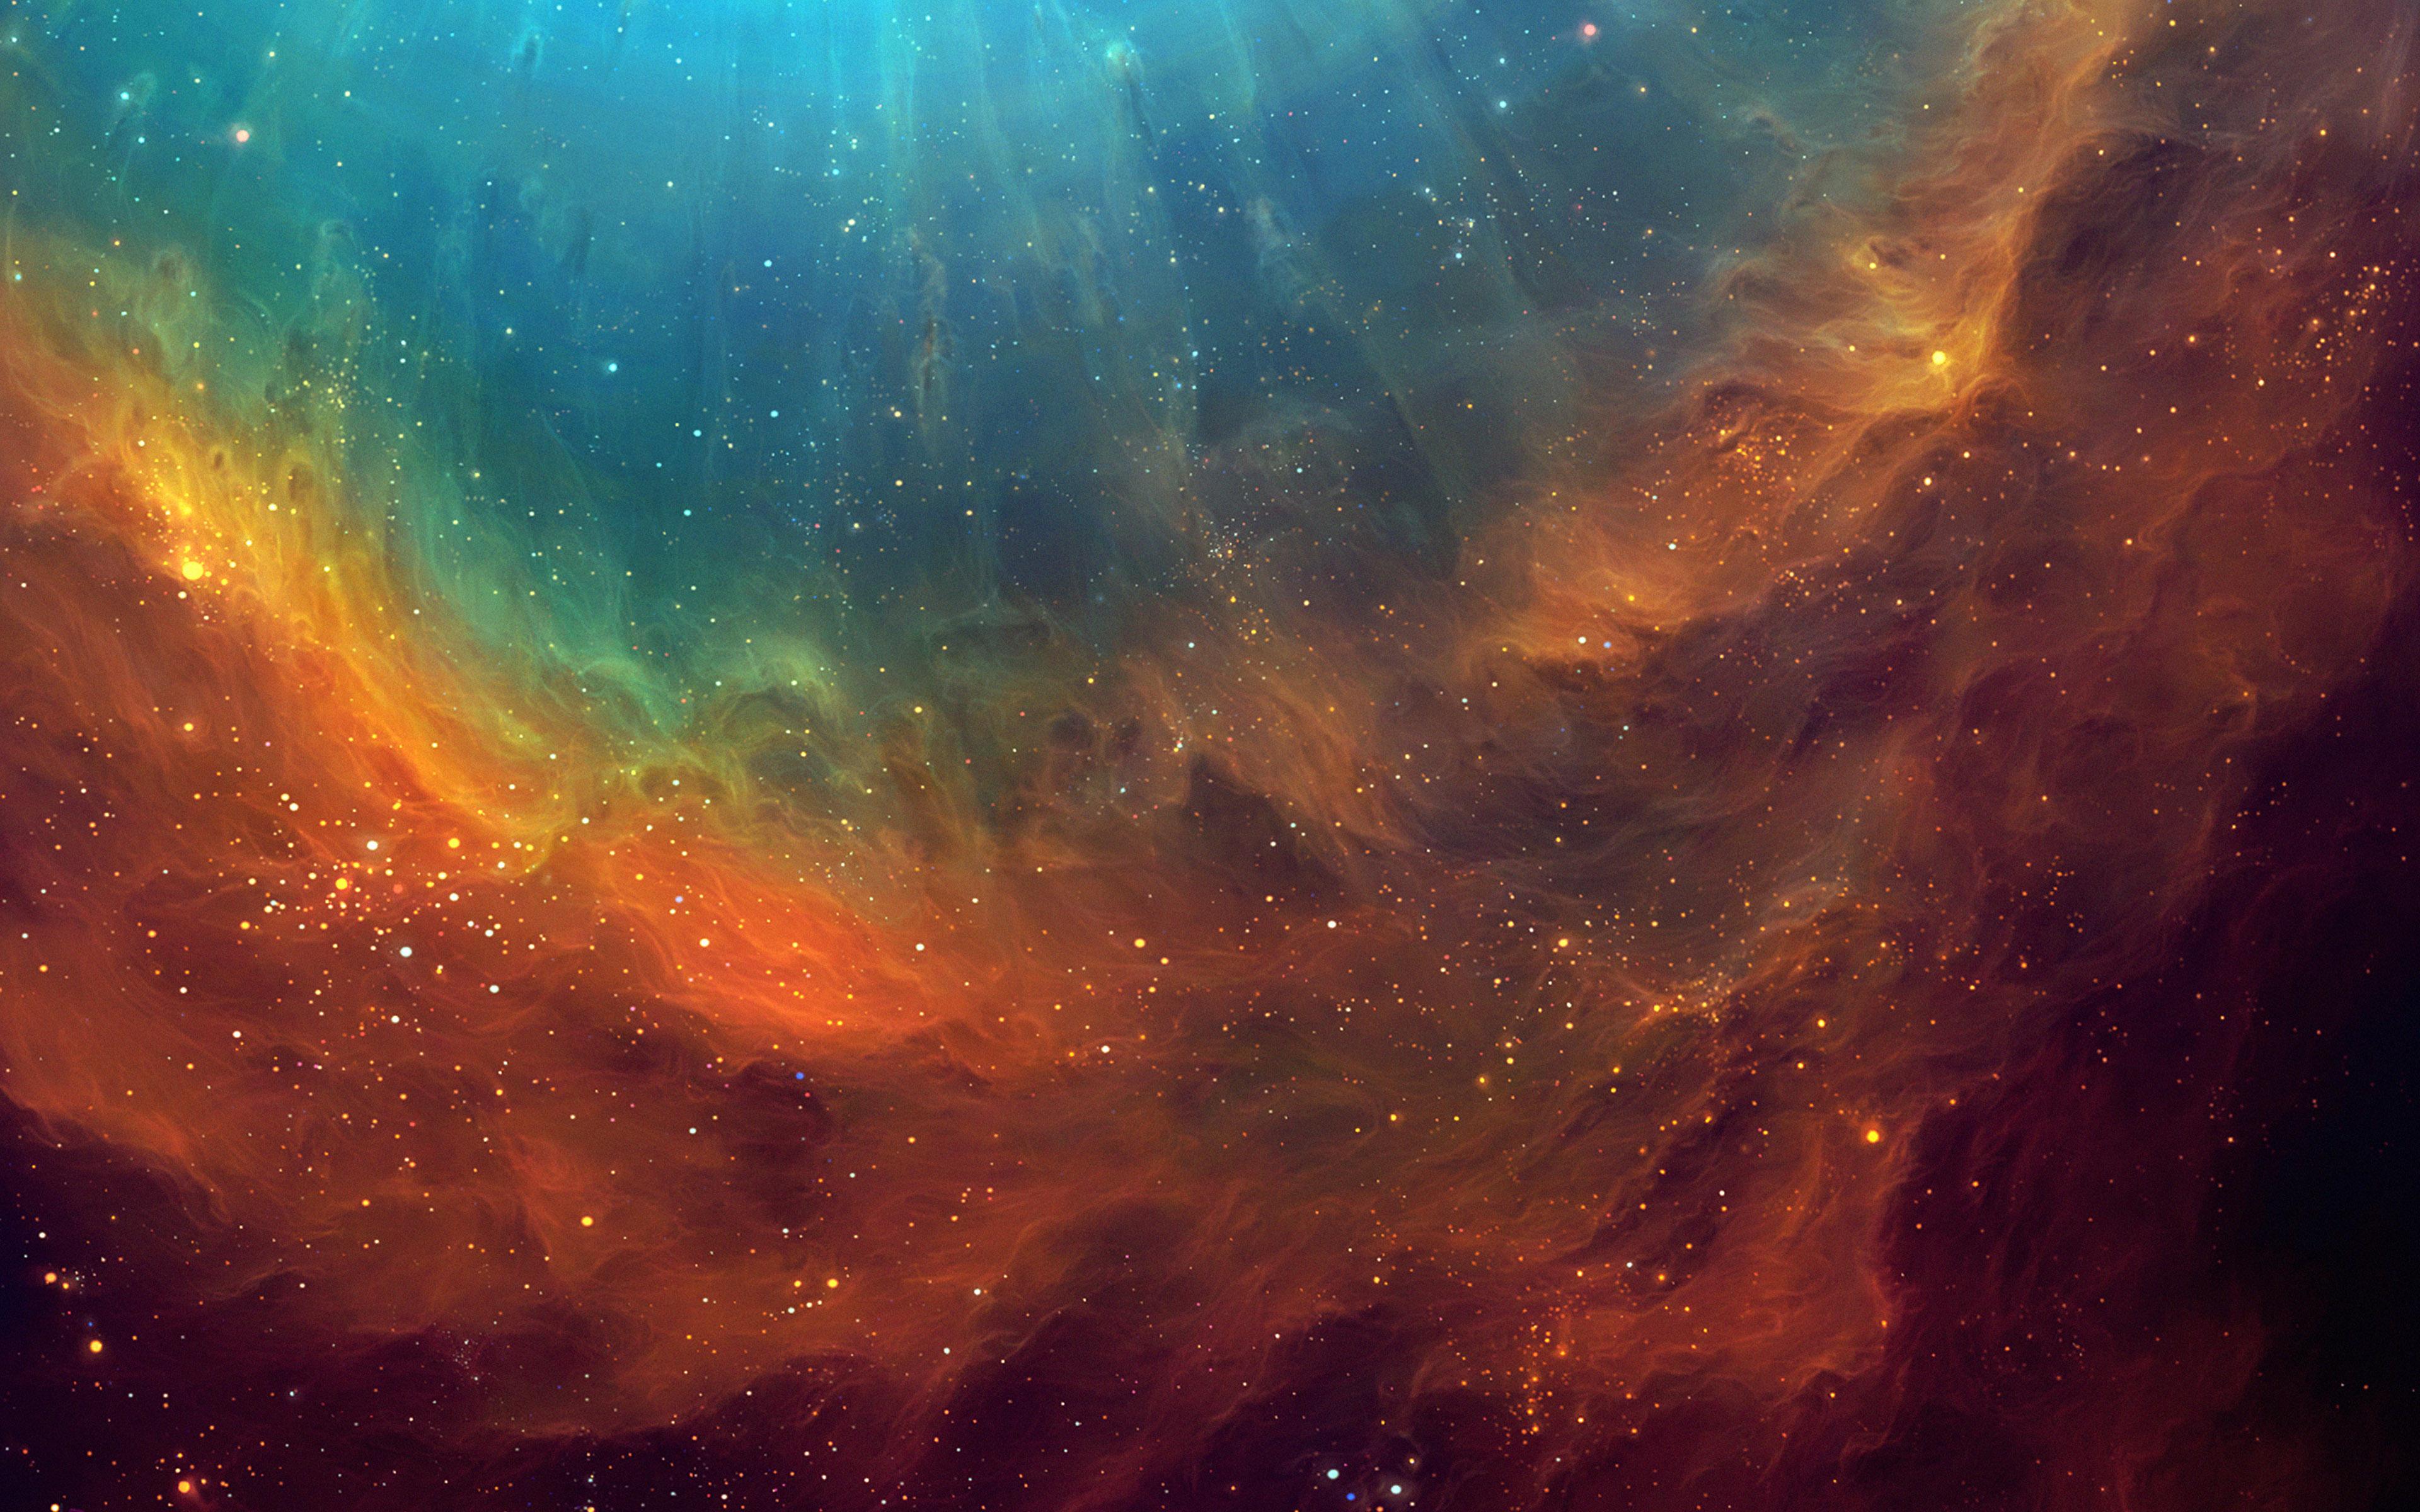 Disney Fall Desktop Wallpaper Md08 Wallpaper Galaxy Eye Space Stars Color Papers Co